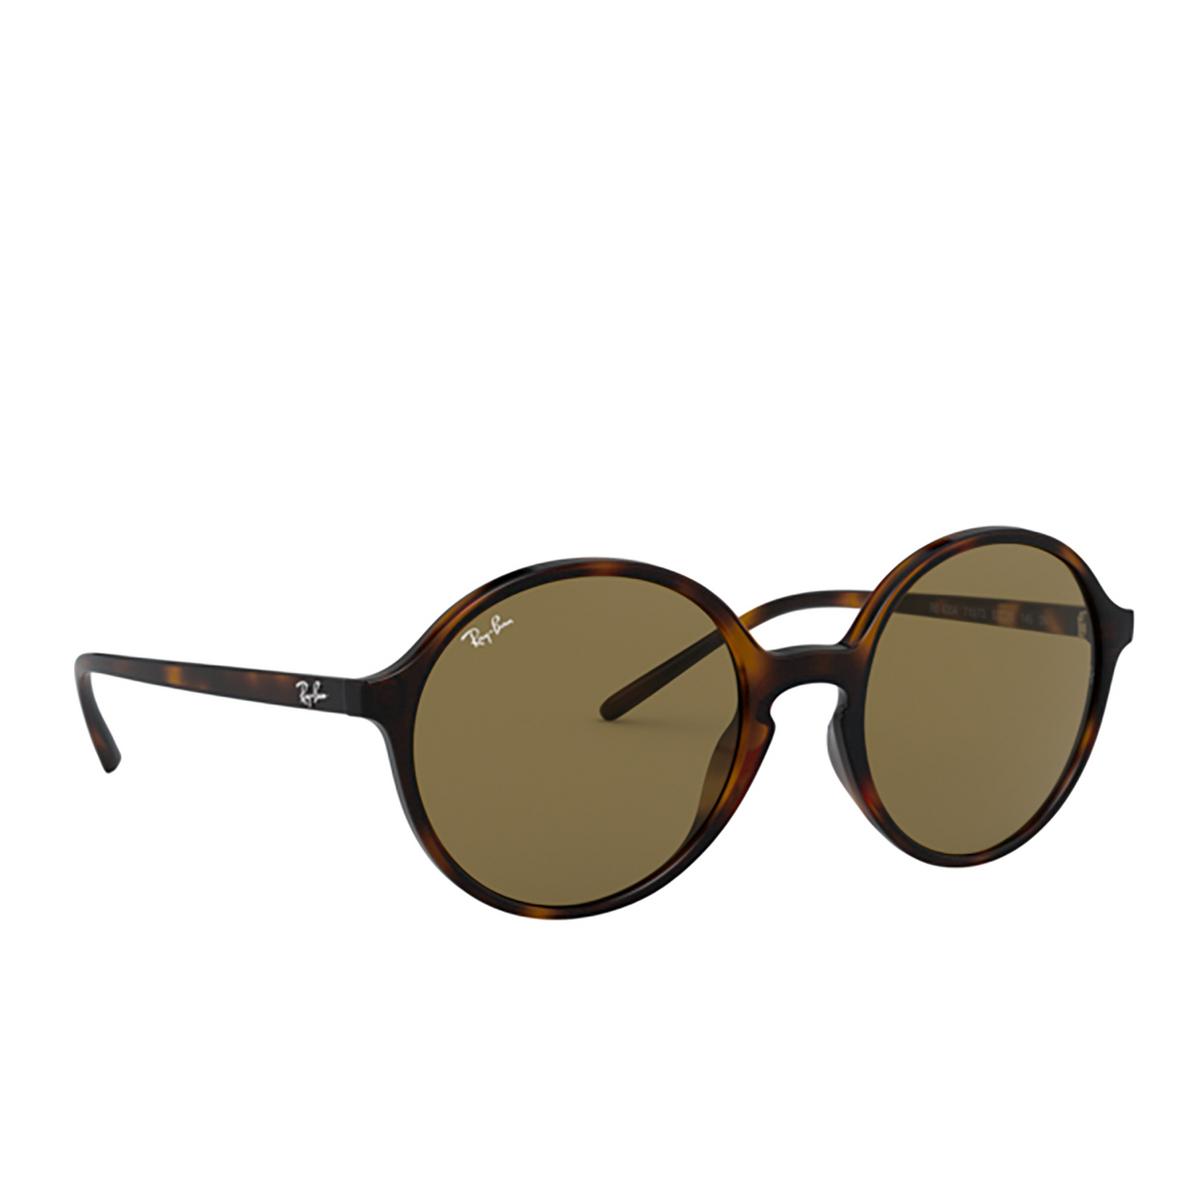 Ray-Ban® Round Sunglasses: RB4304 color Havana 710/73 - 2/3.